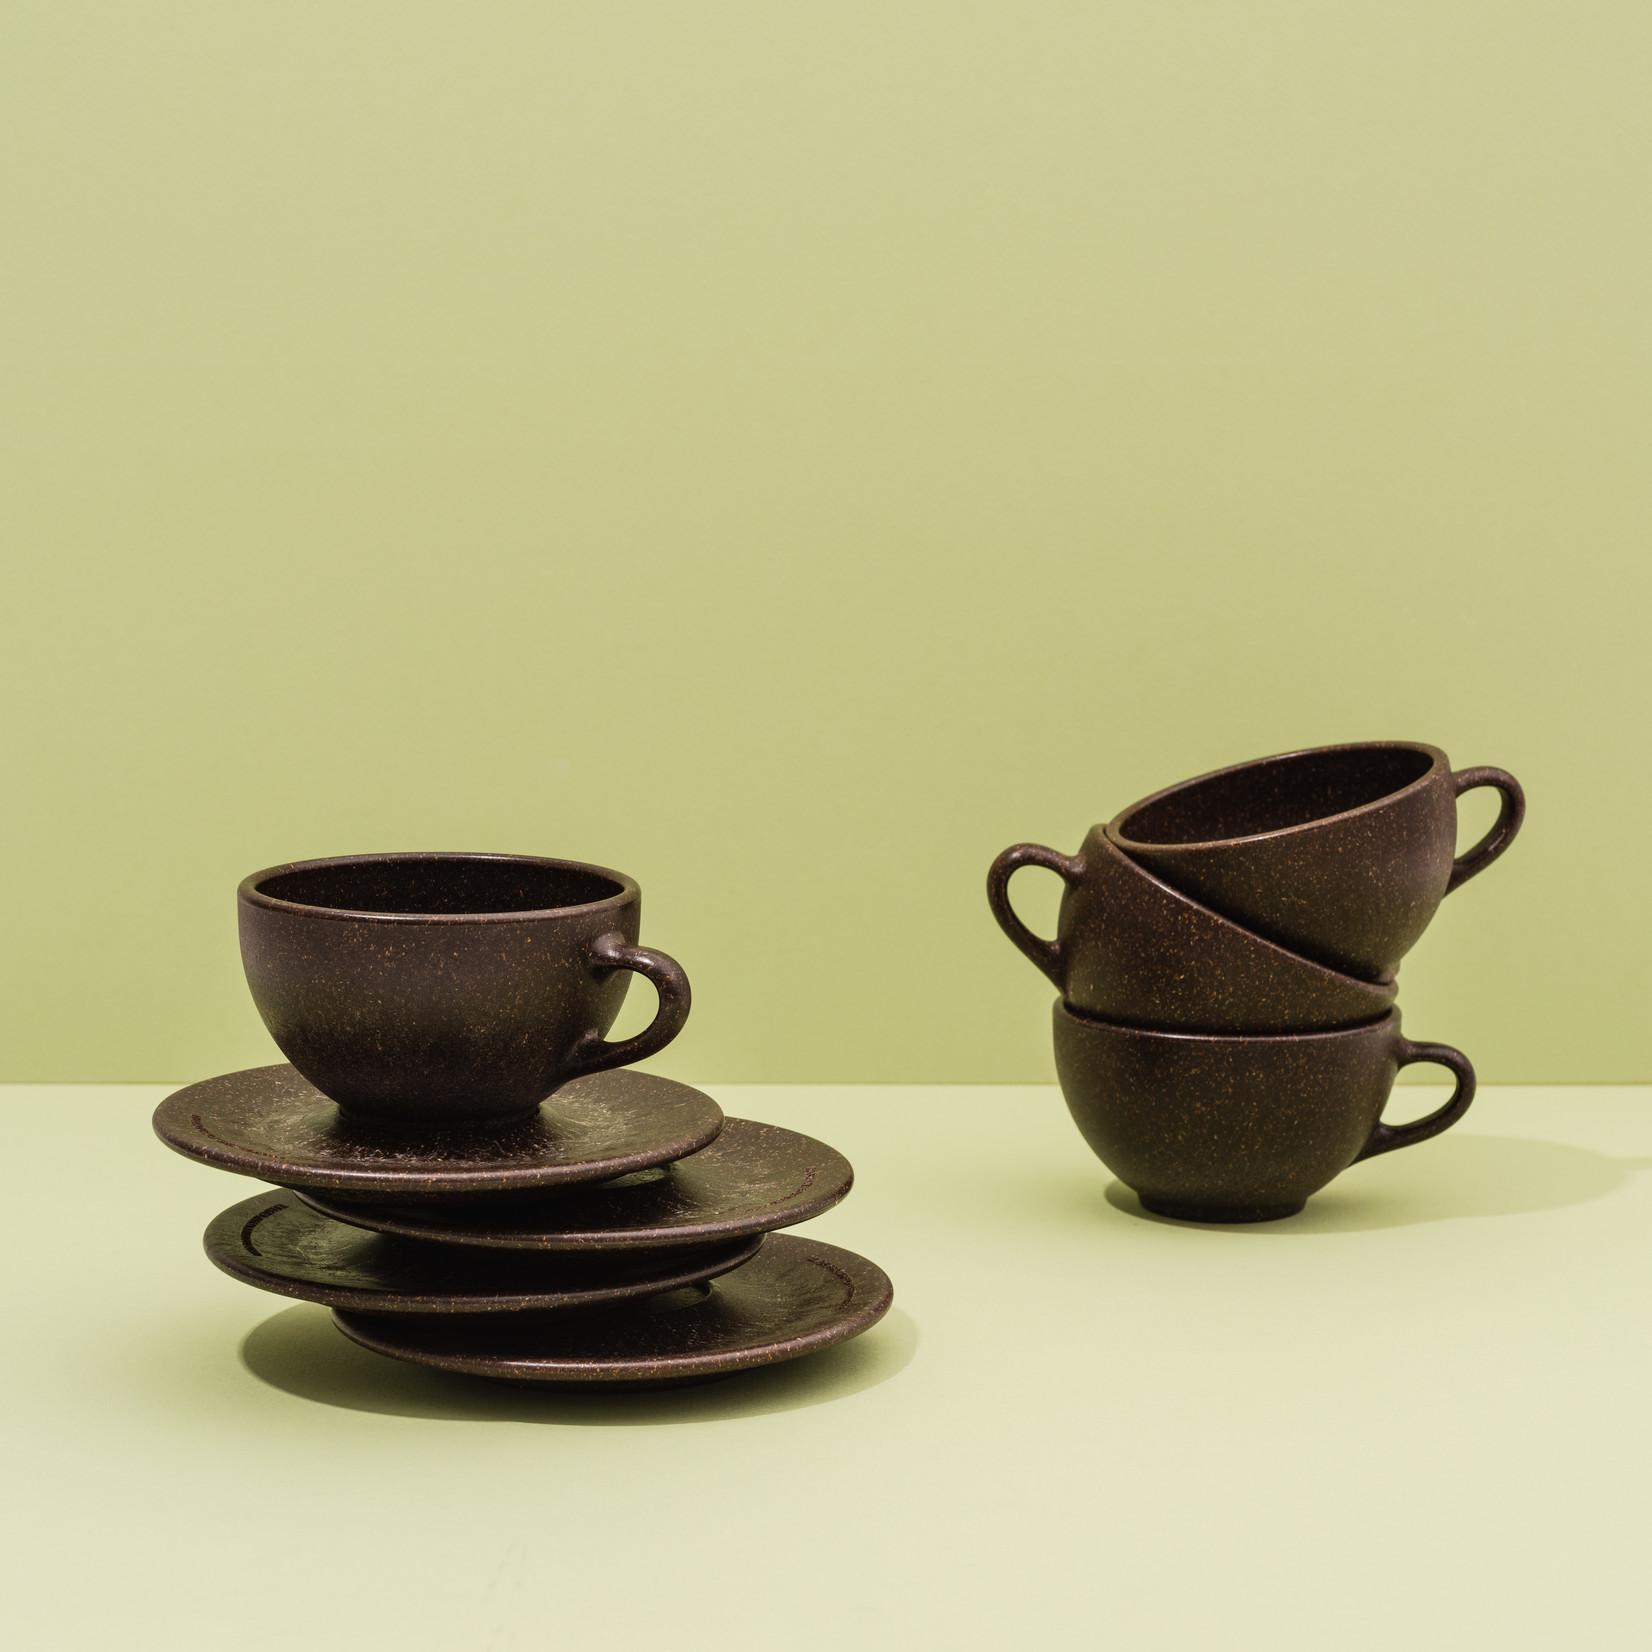 Kaffee form Latte Cup, 290ml